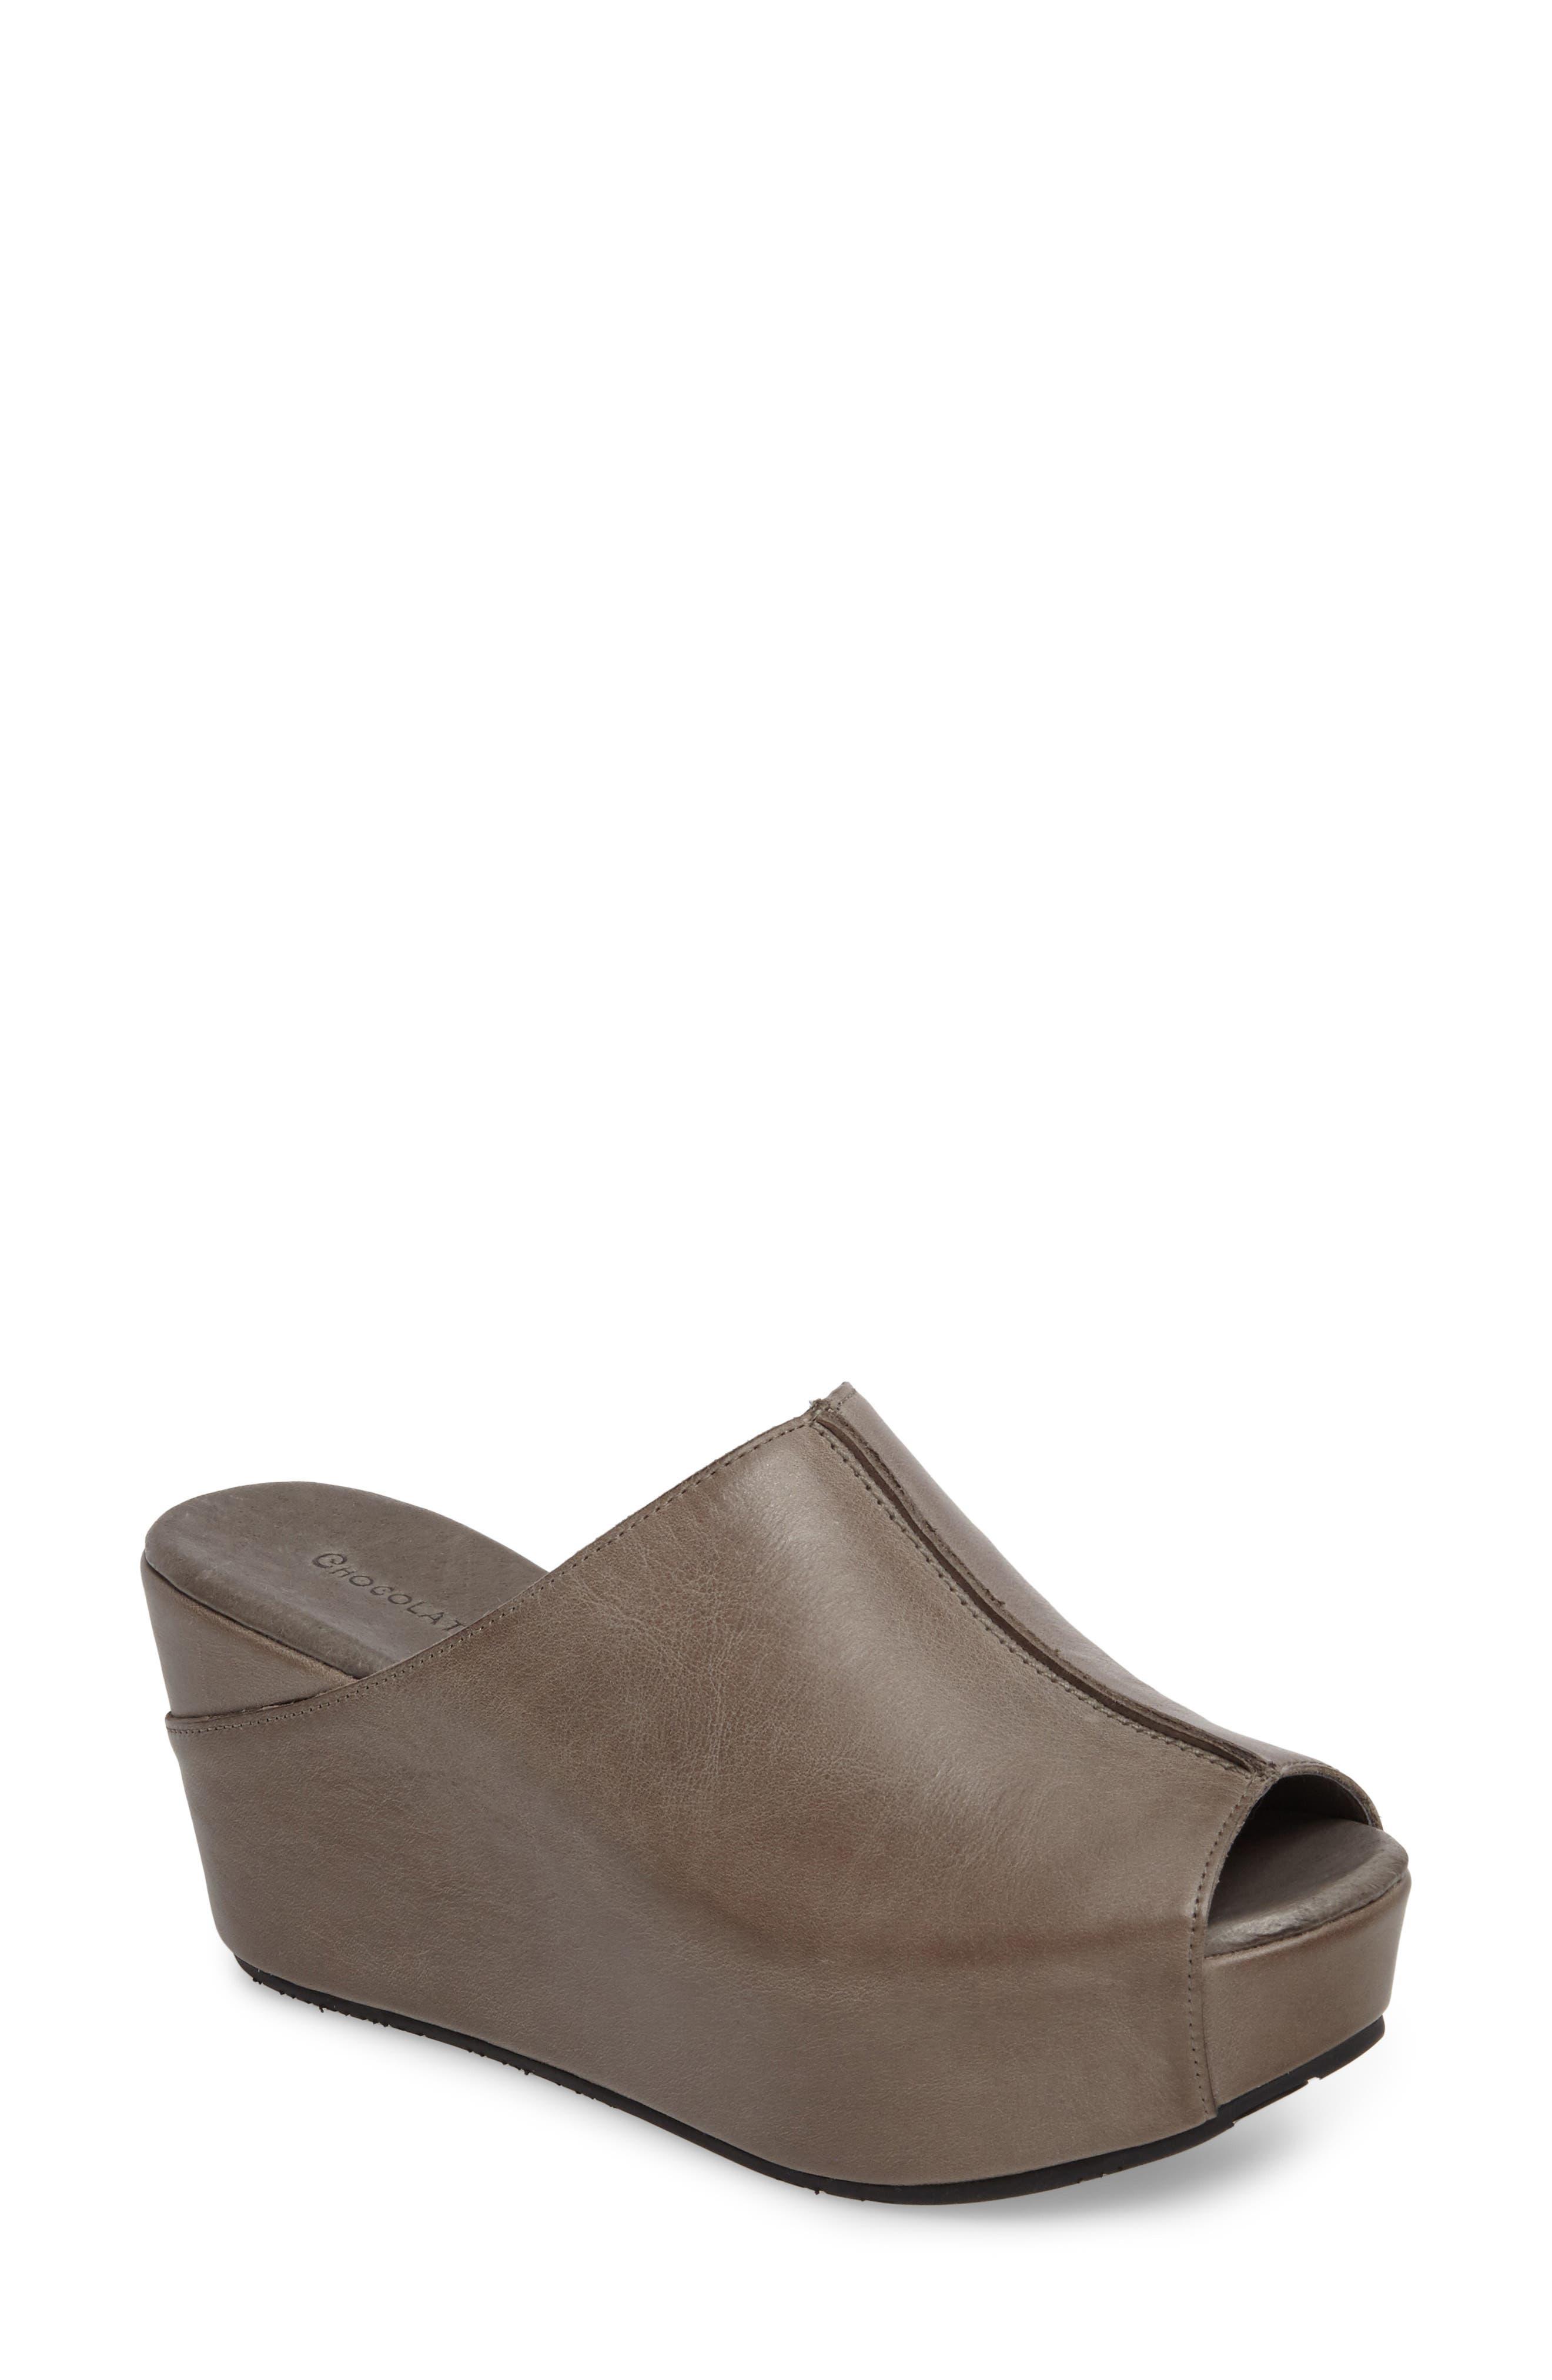 Wynn Peep Toe Mule,                             Main thumbnail 1, color,                             Graphite Leather